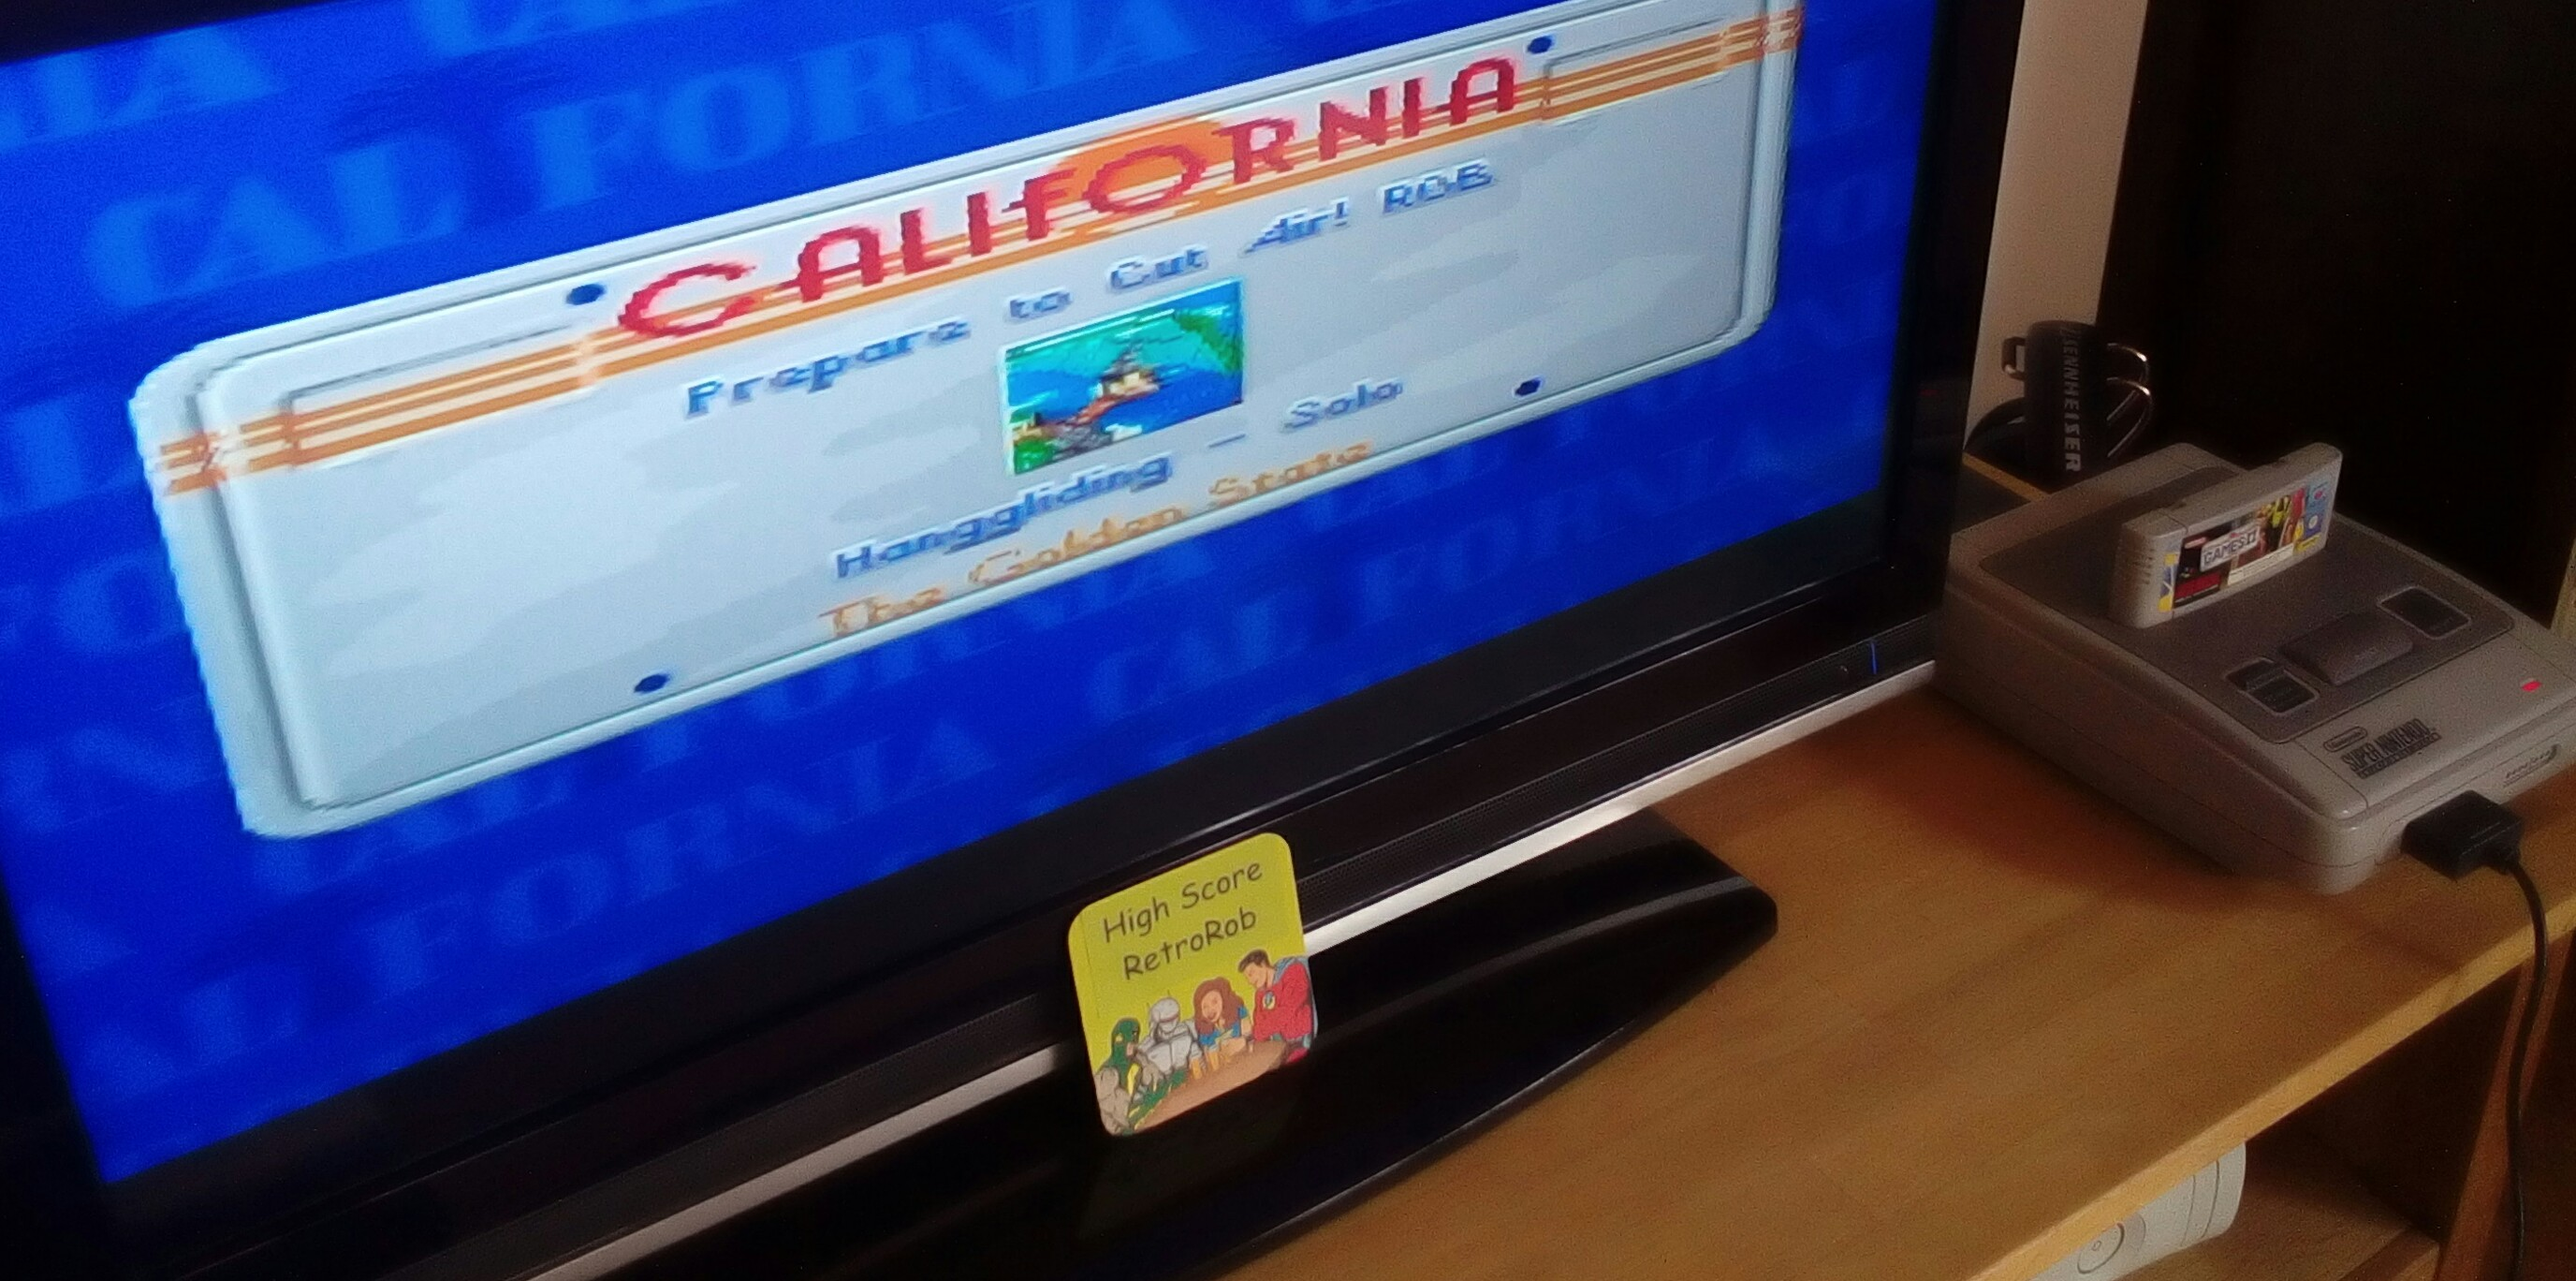 California Games II [Hang Gliding] 19,200 points